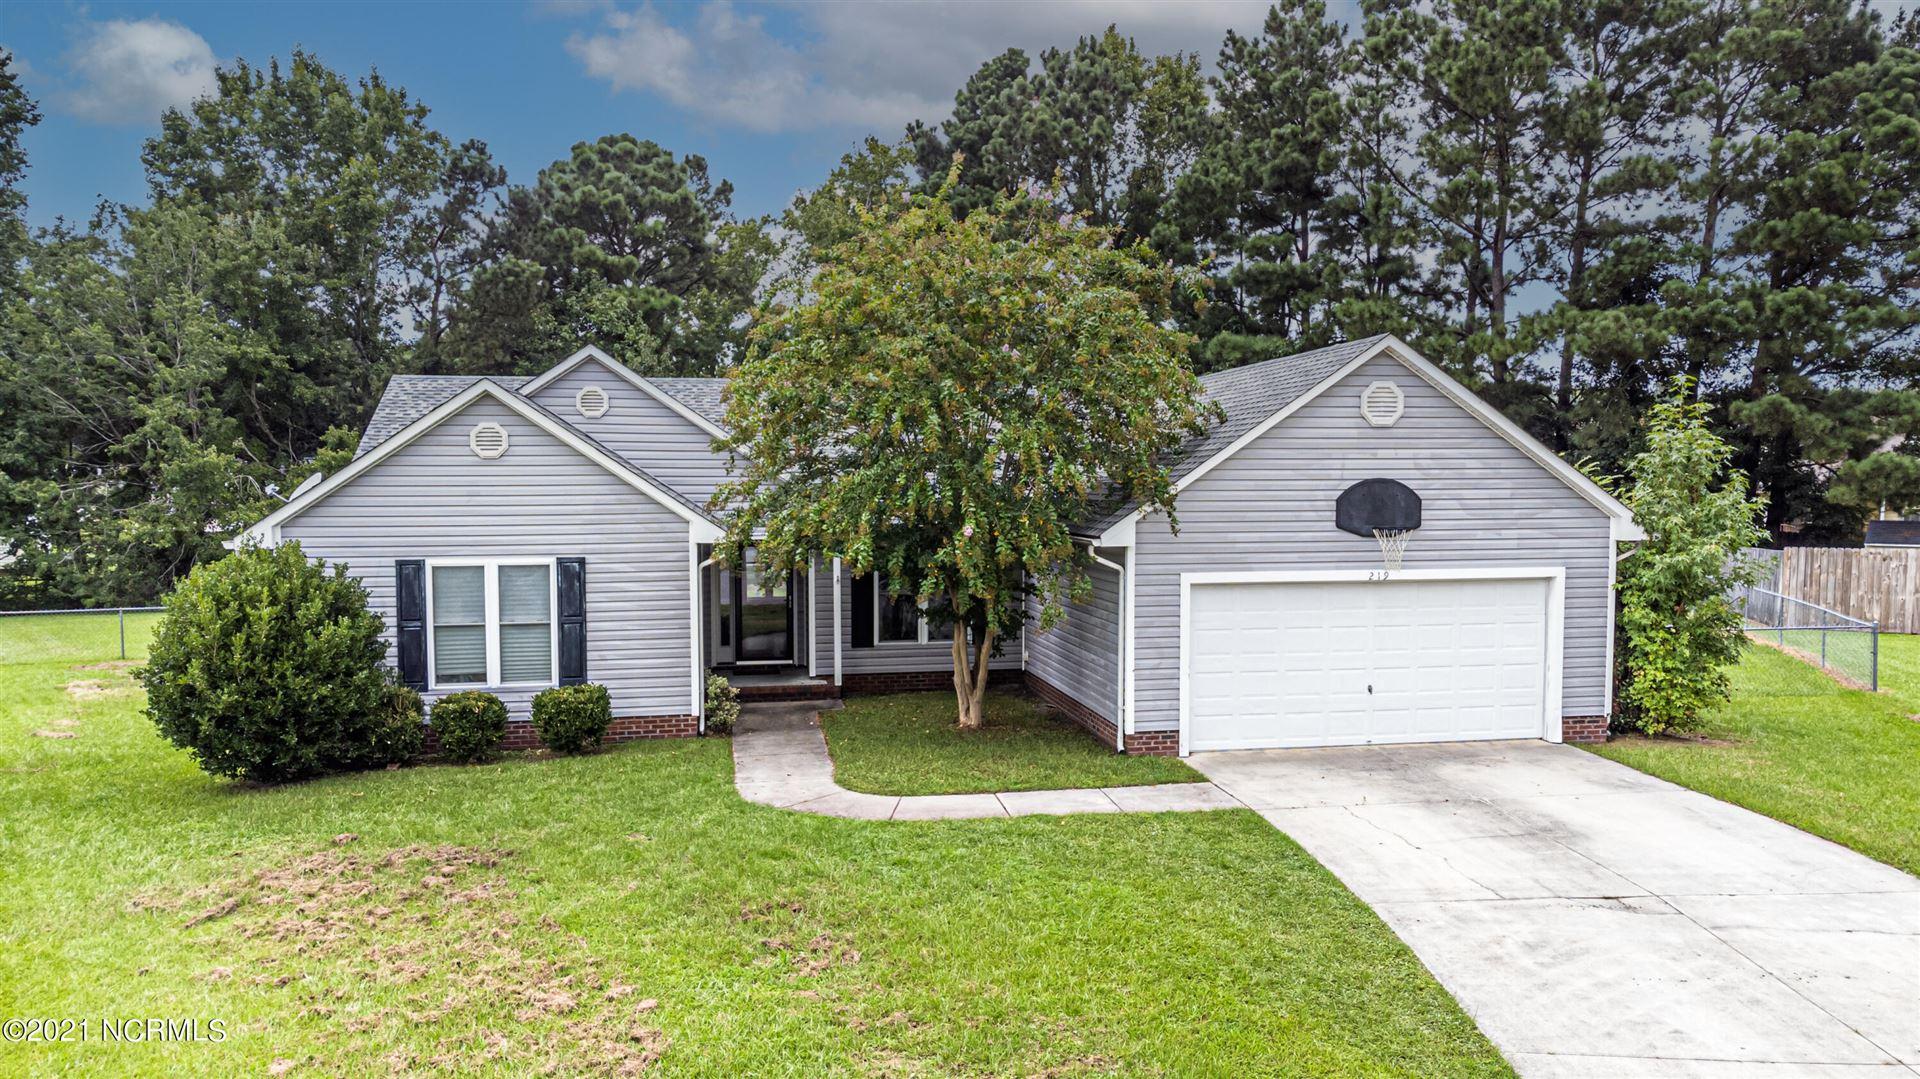 Photo of 219 Stone Point Lane, Jacksonville, NC 28540 (MLS # 100289423)